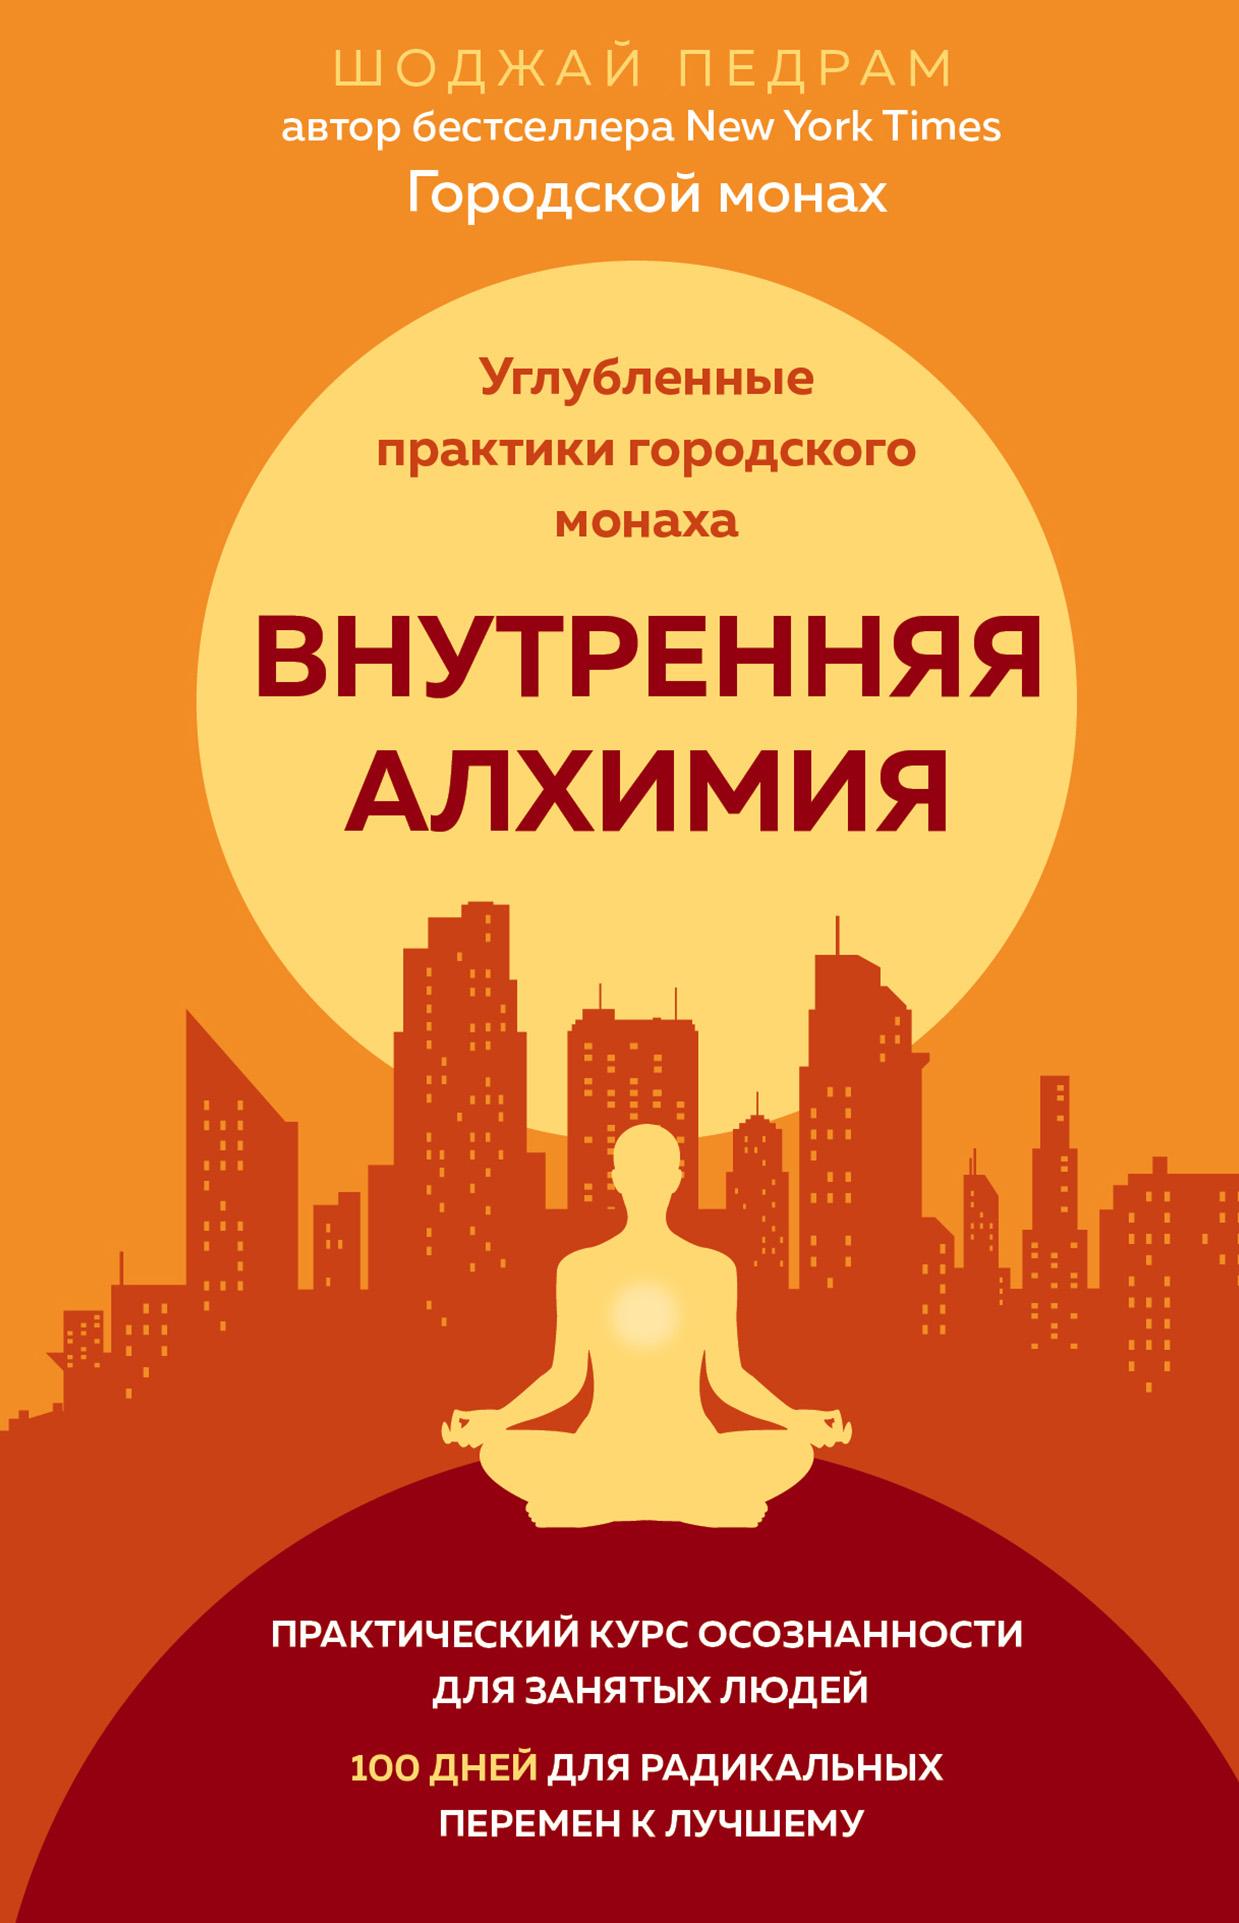 Электронная книга «Внутренняя алхимия» – Педрам Шоджай